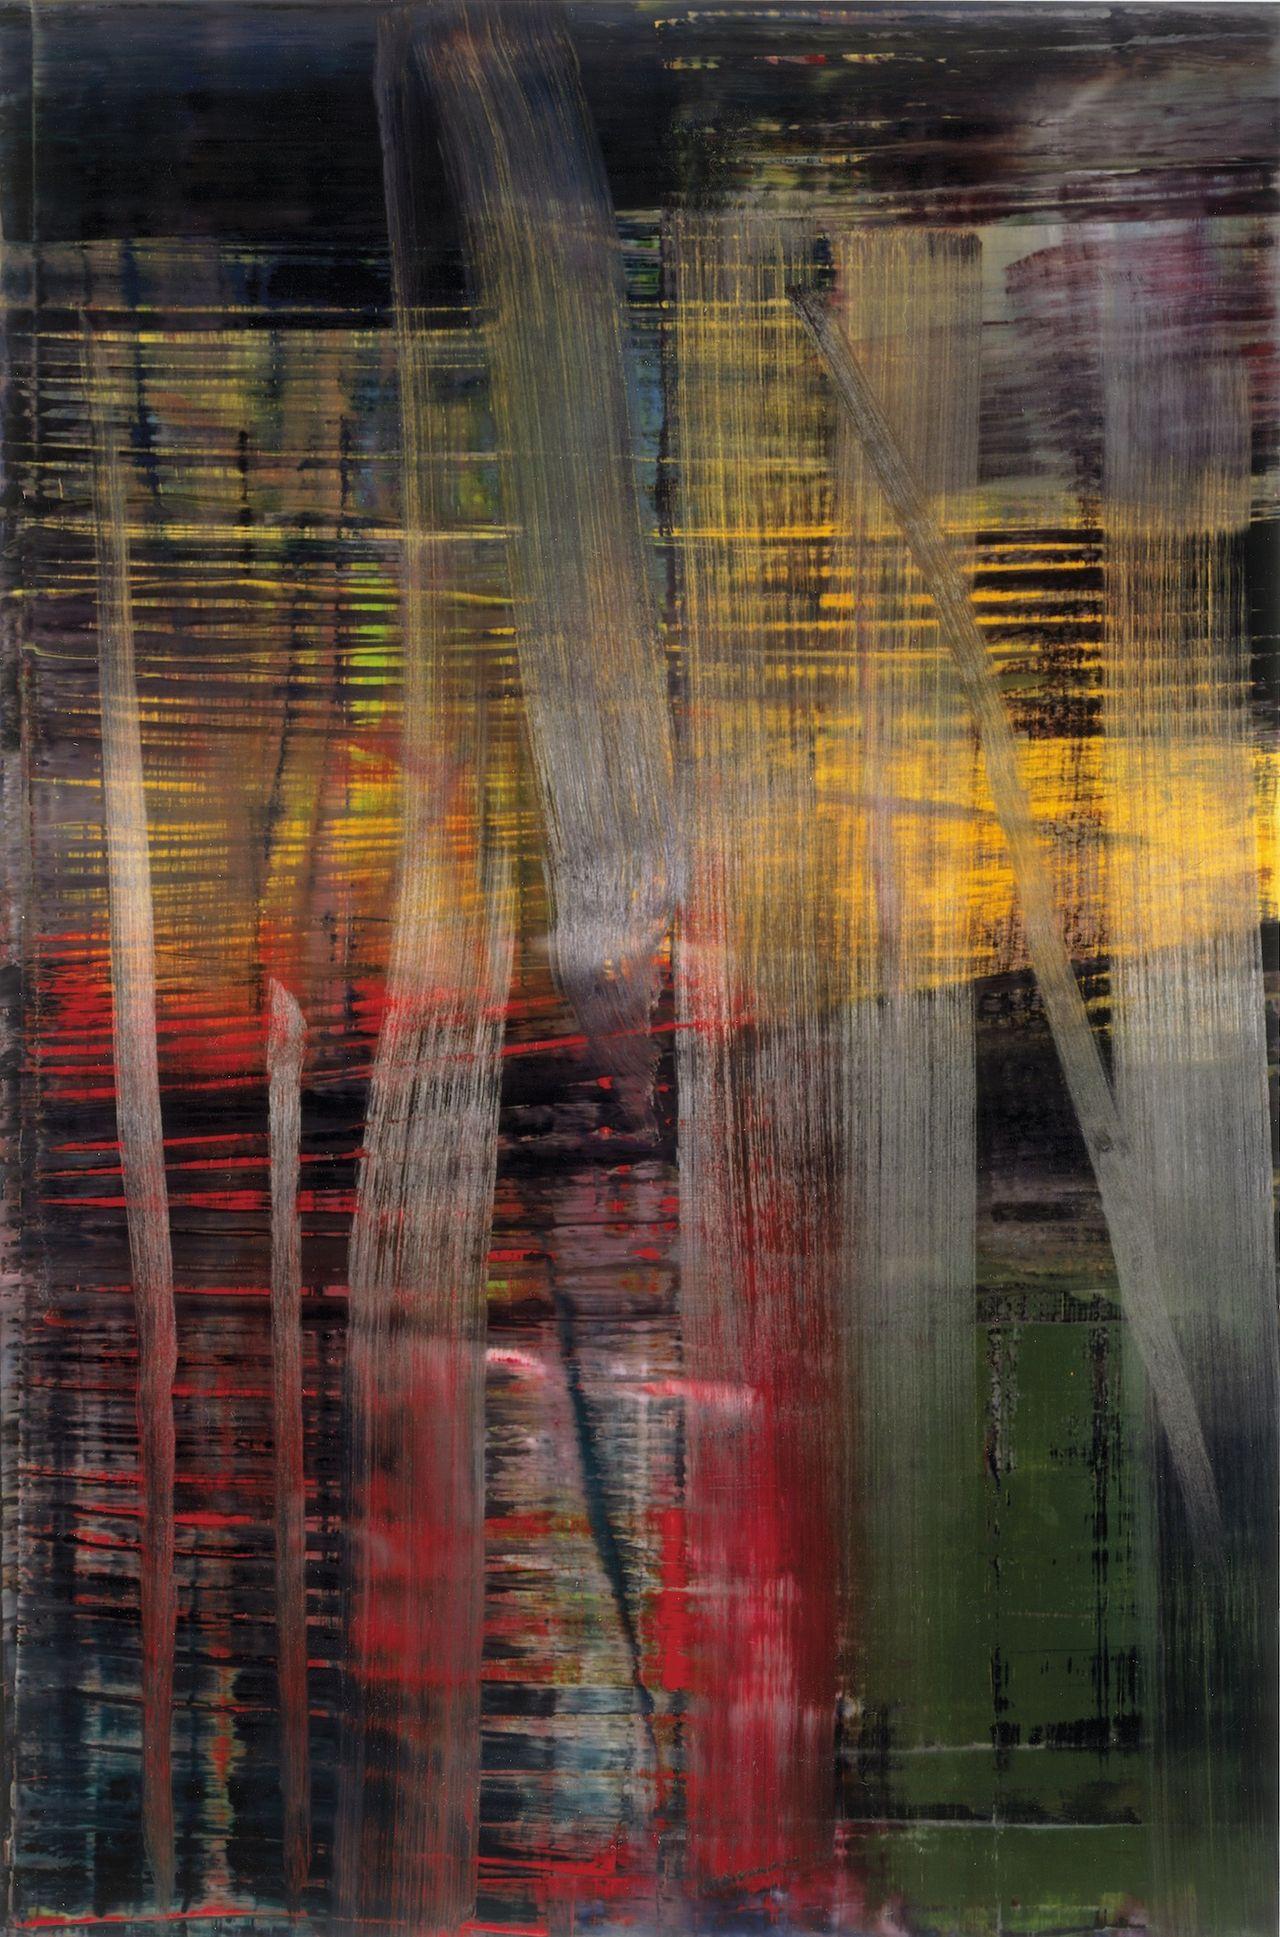 Gerhard Richter, Forest (4) (2005) © Gerhard Richter